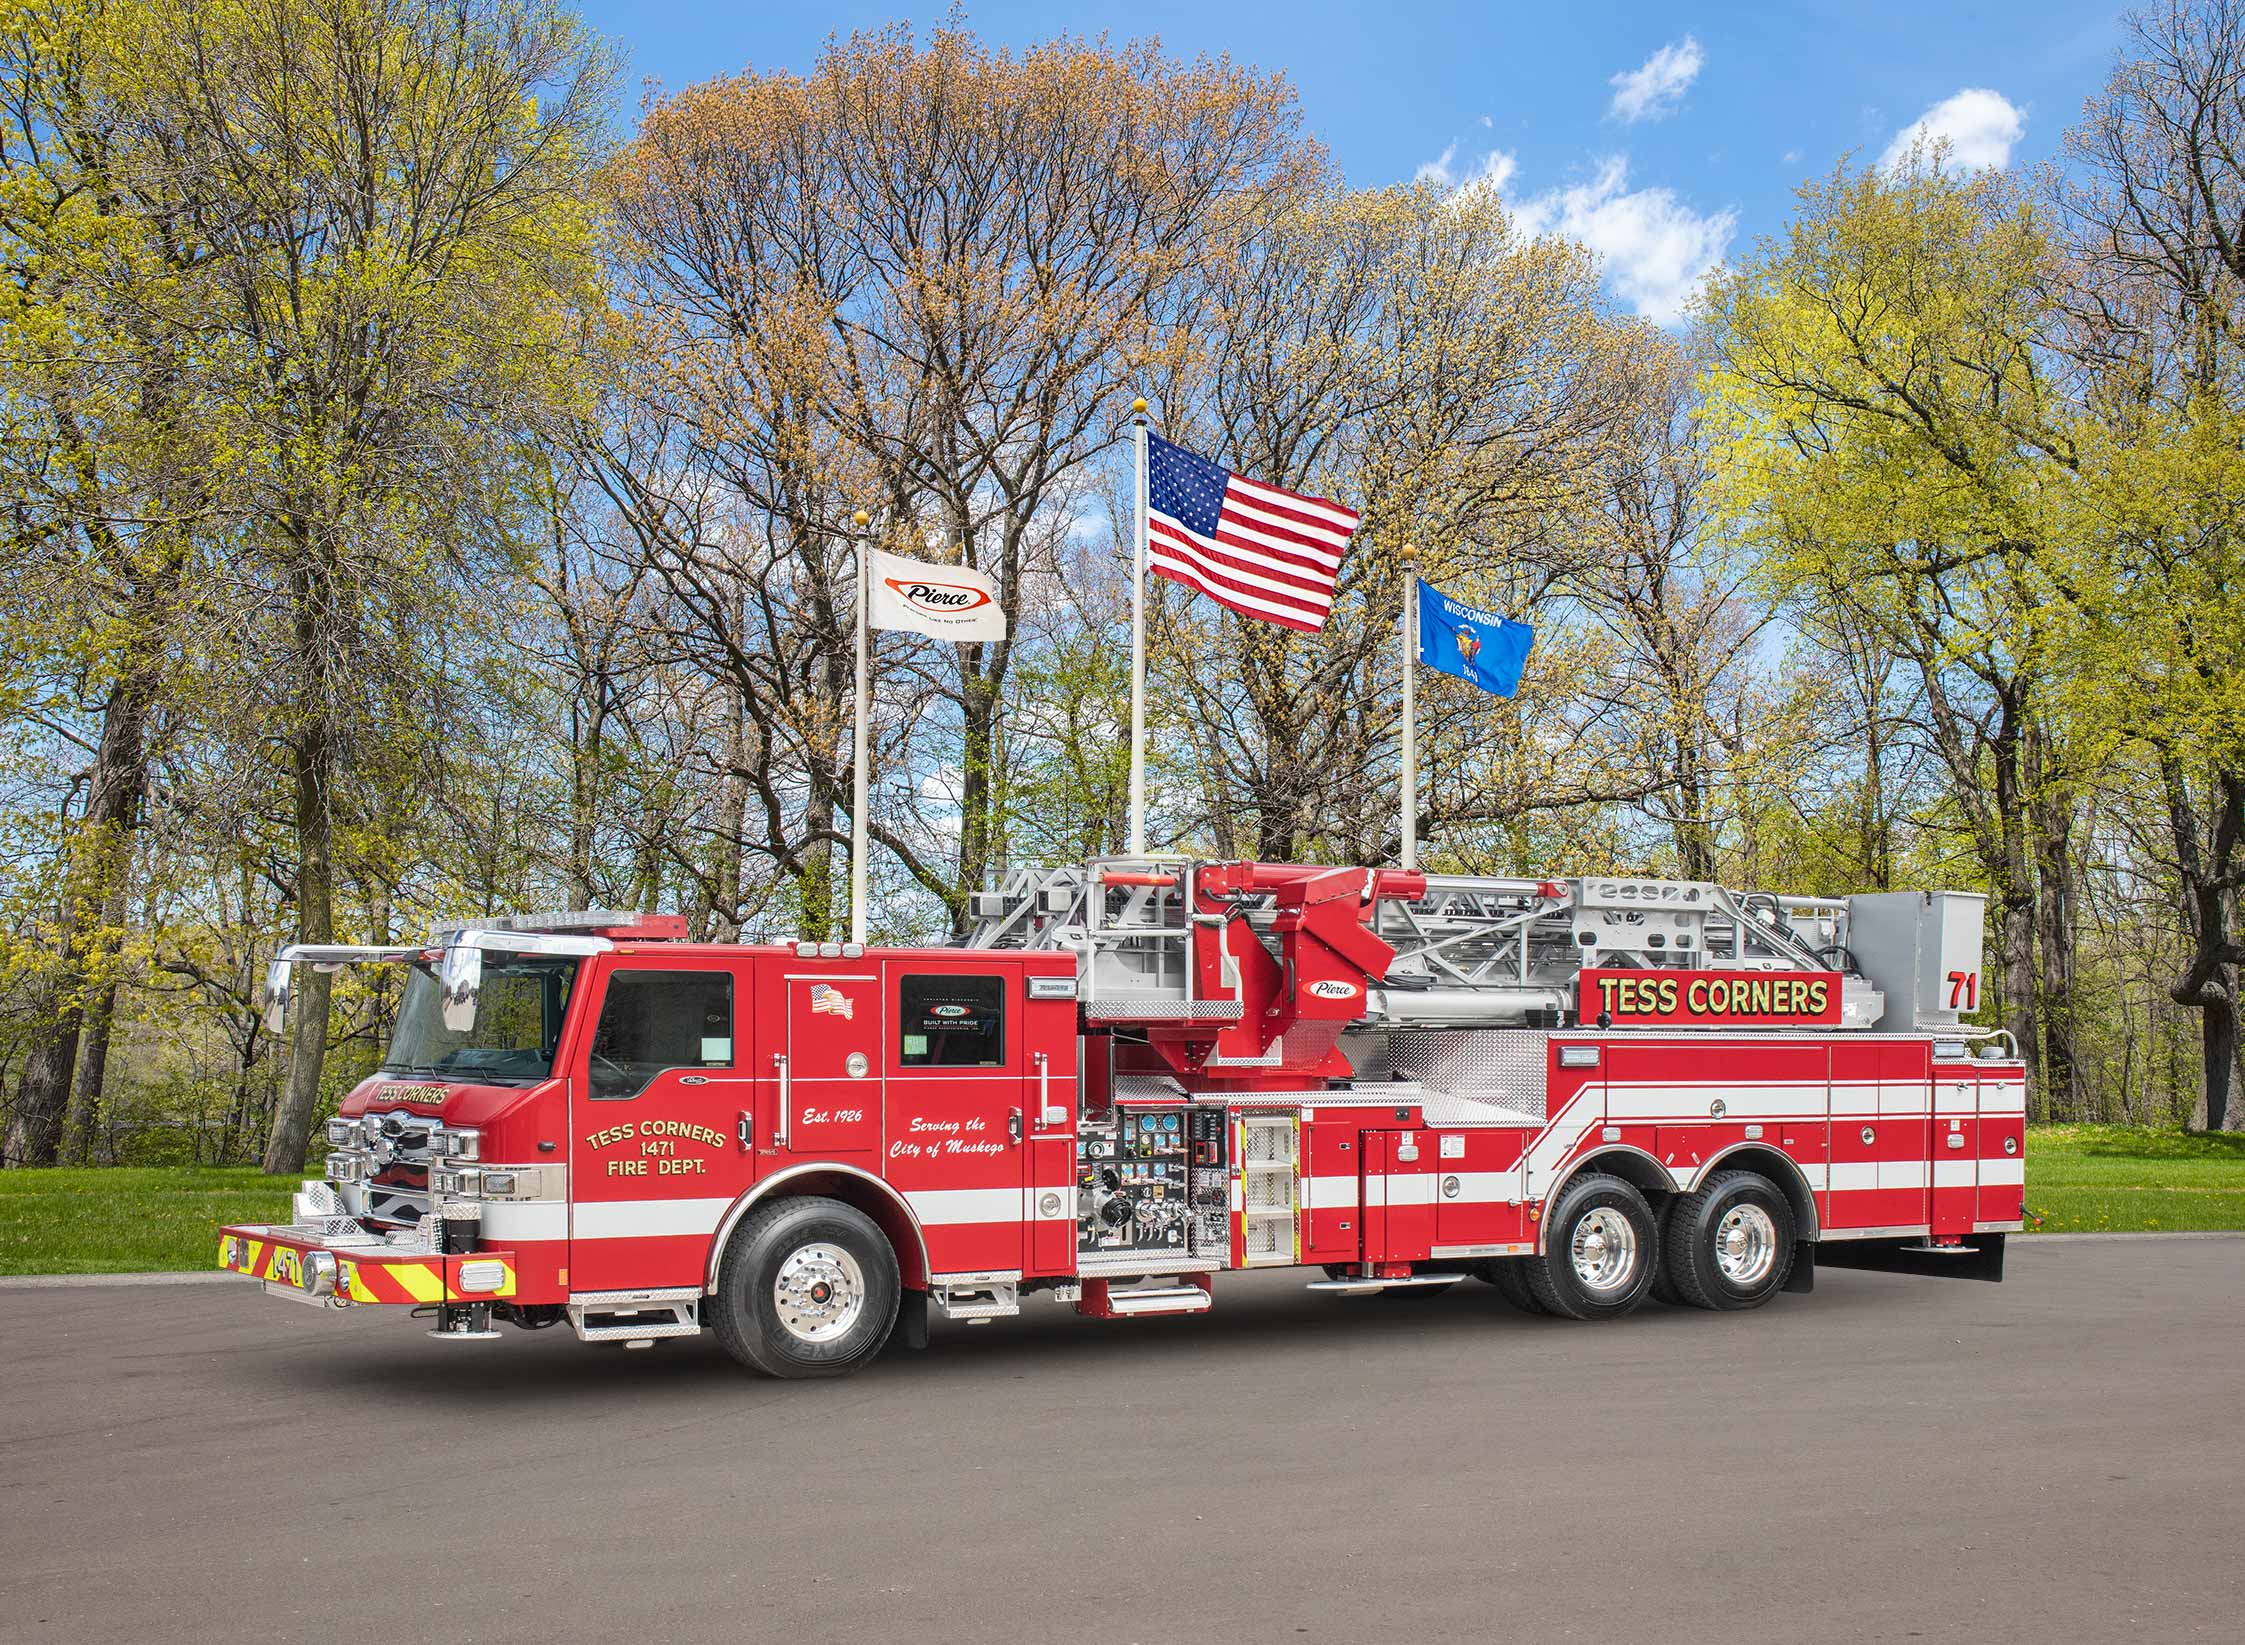 Tess Corners Volunteer Fire Department - Aerial